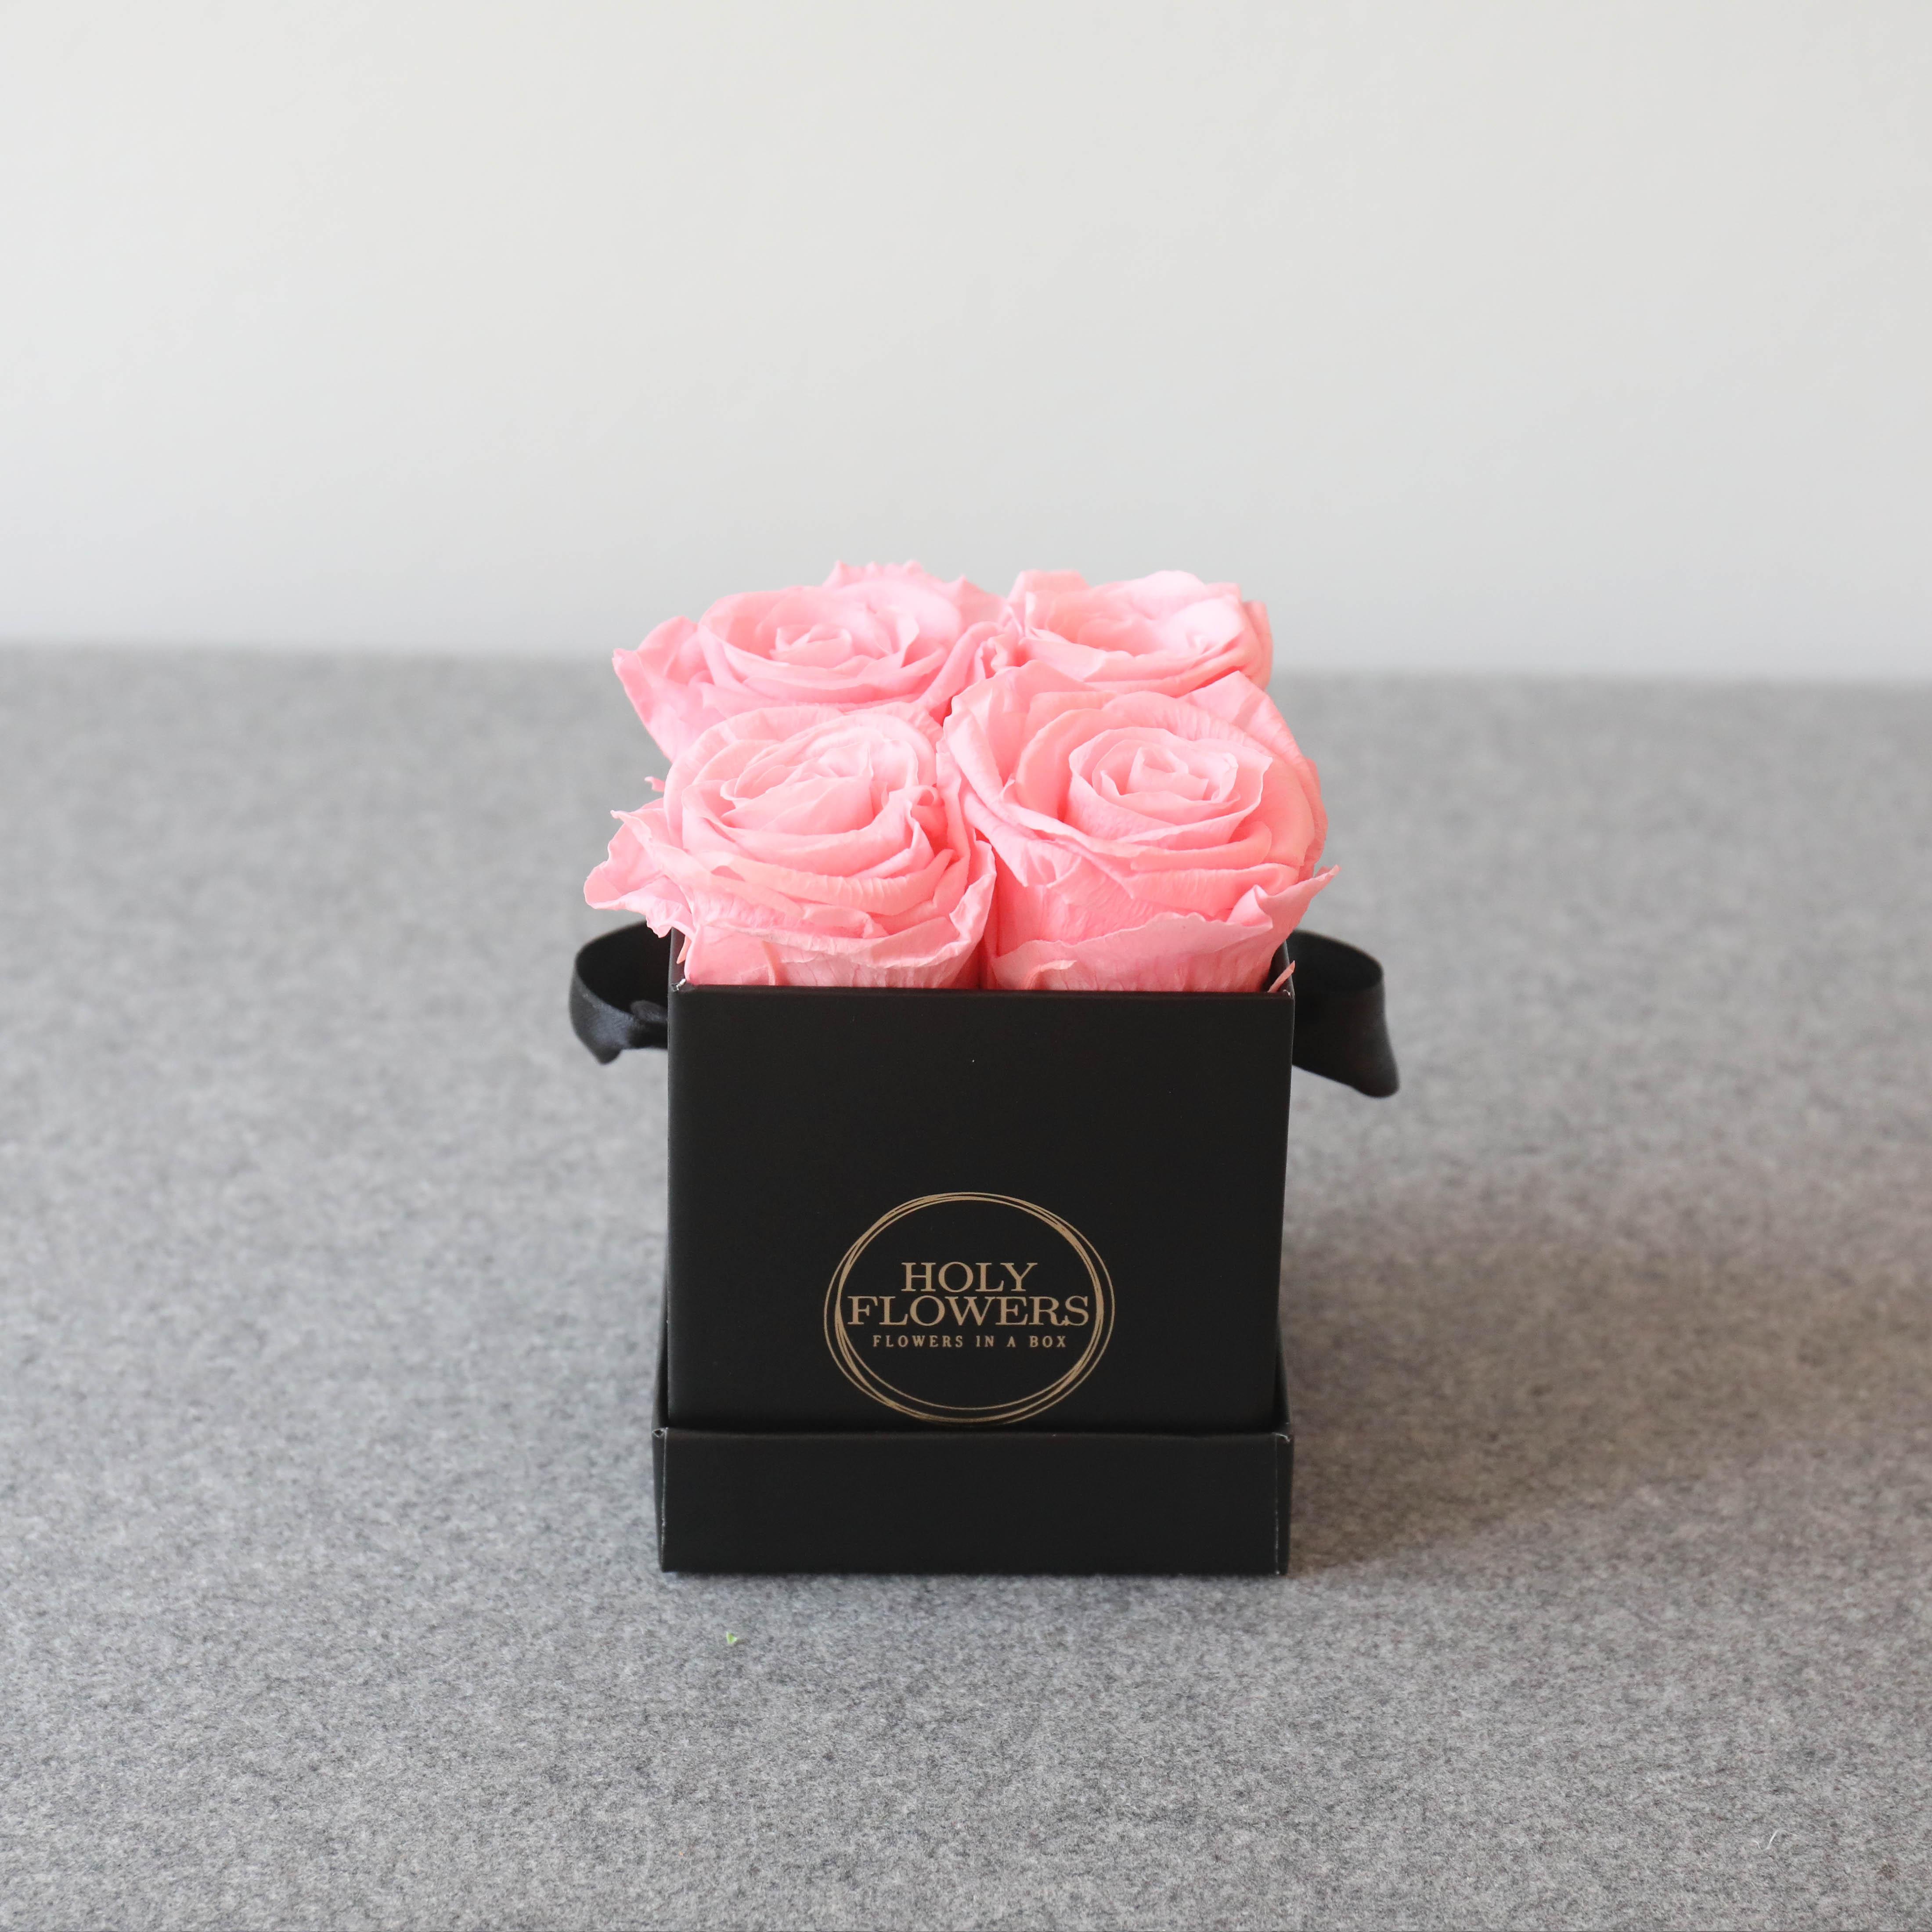 rosa rosen in der box blumenboxen holy flowers rosen in der box exklusive rosenboxen. Black Bedroom Furniture Sets. Home Design Ideas